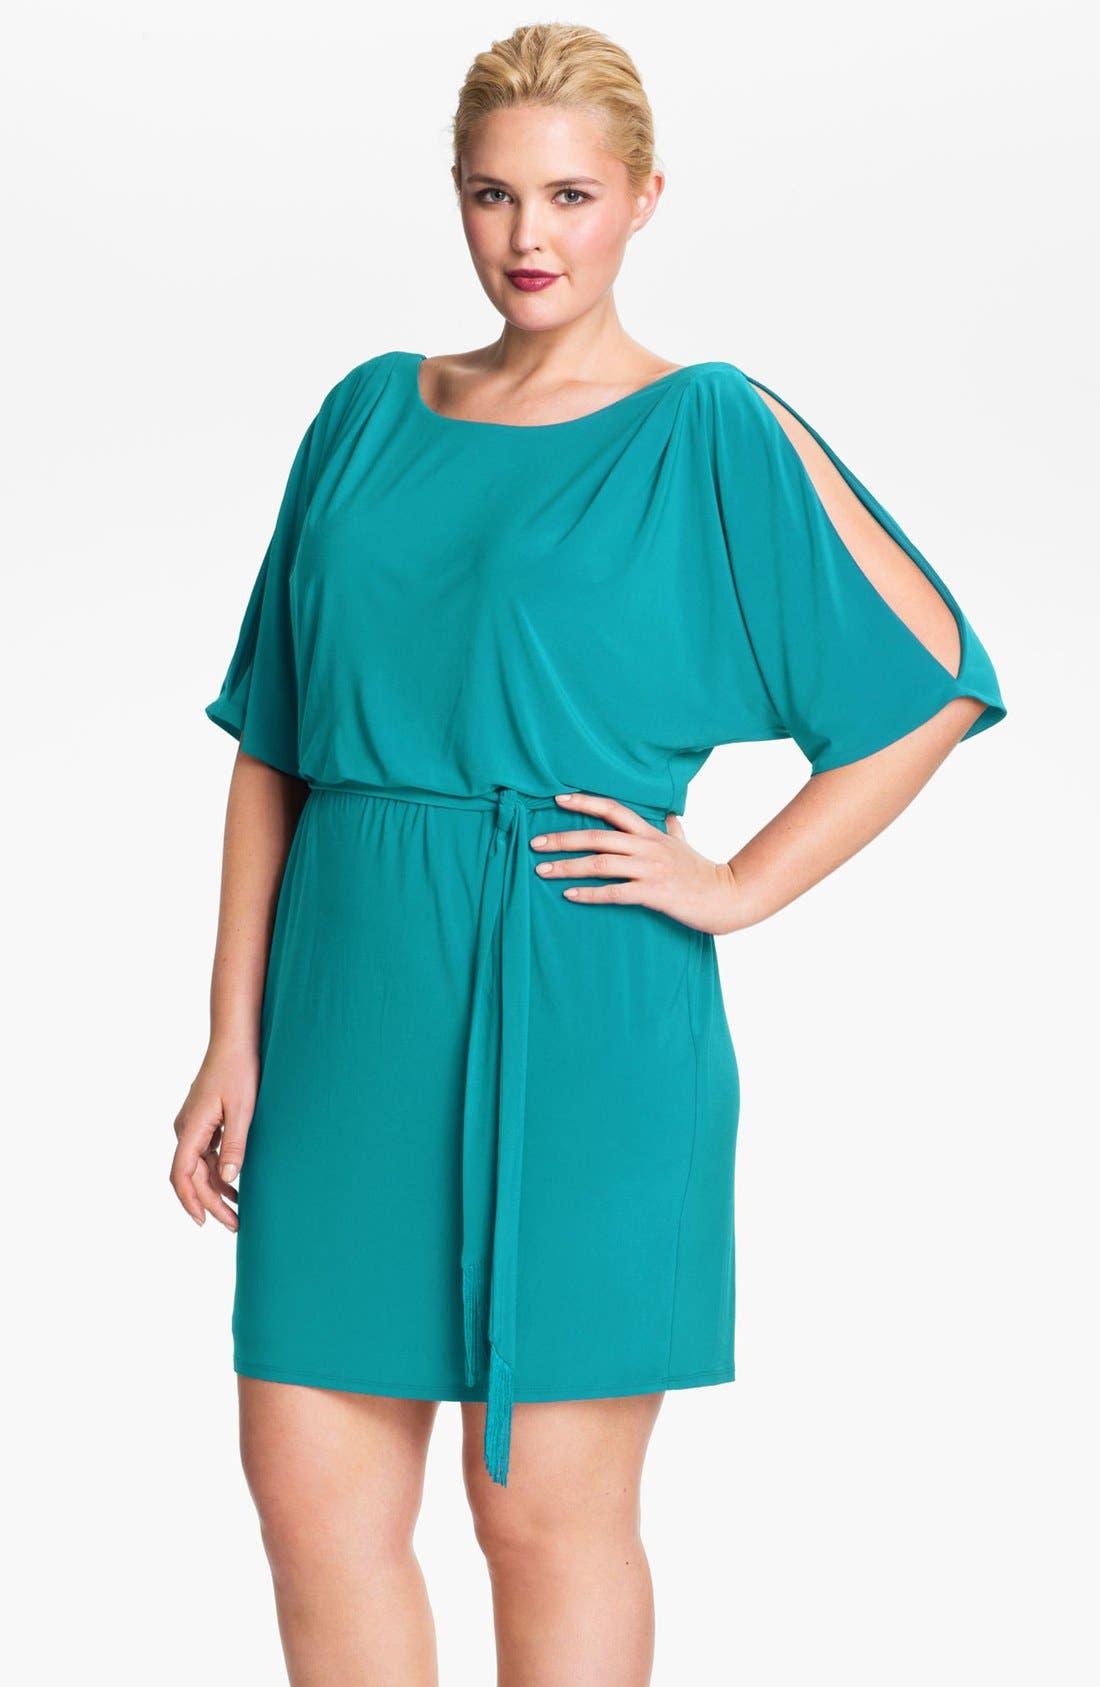 Alternate Image 1 Selected - Jessica Simpson Cold Shoulder Matte Jersey Blouson Dress (Plus Size)